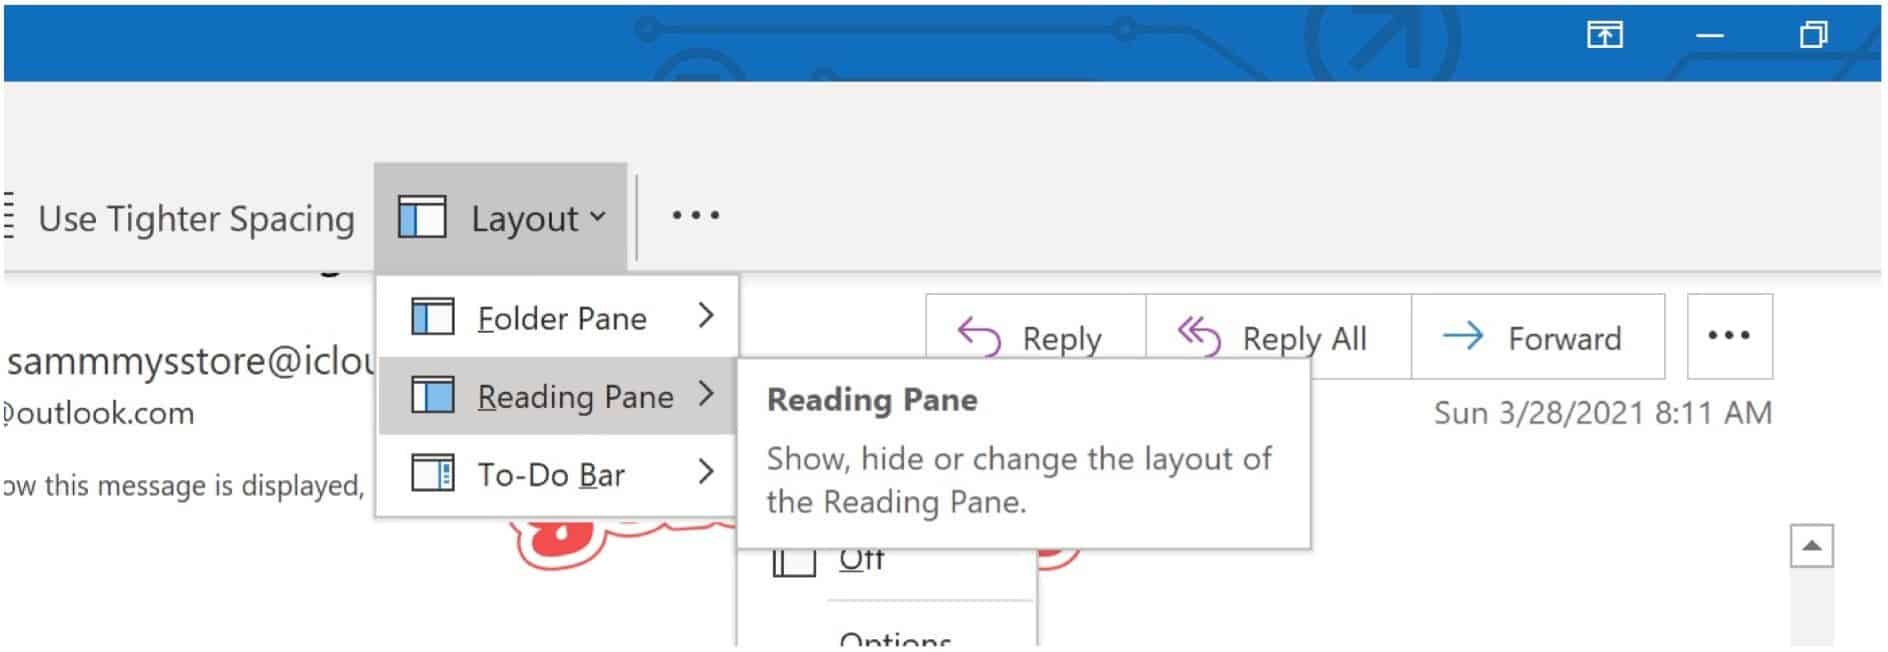 Microsoft Outlook Reading Pane